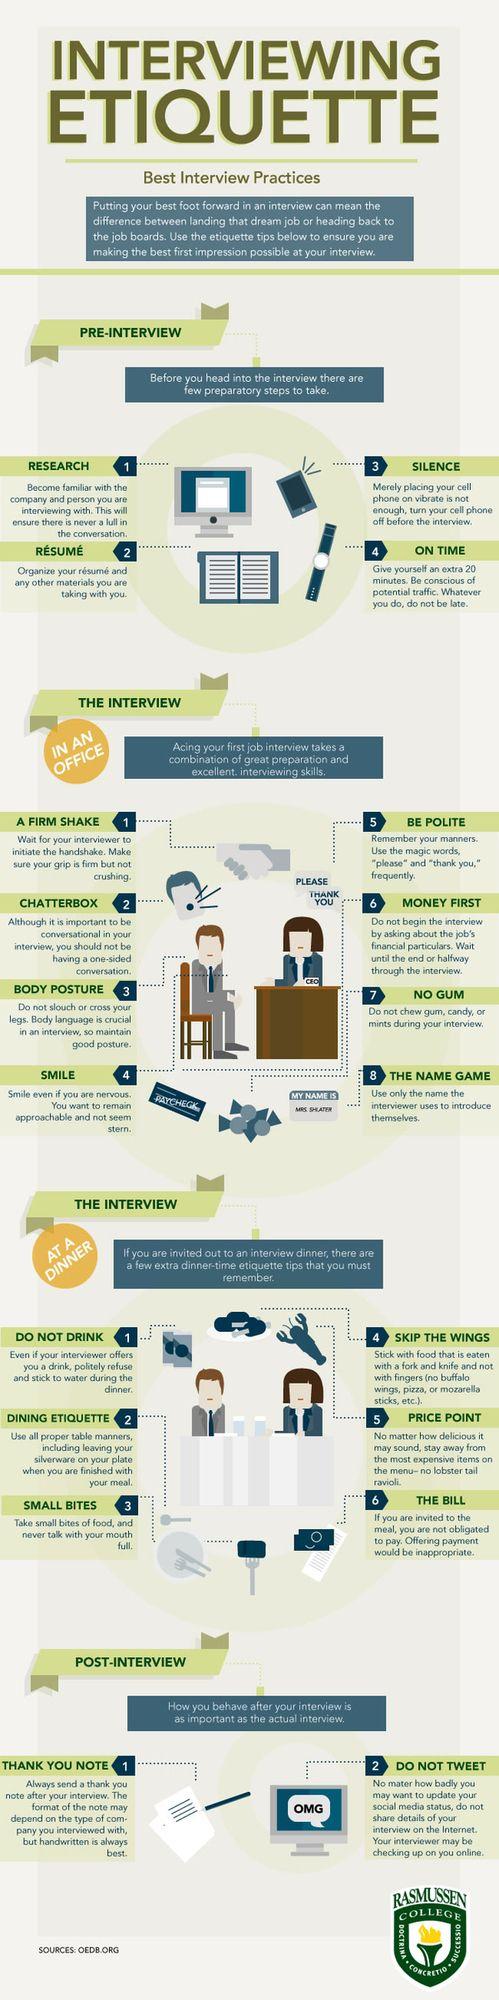 Interviewing Etiquette (Infographic)